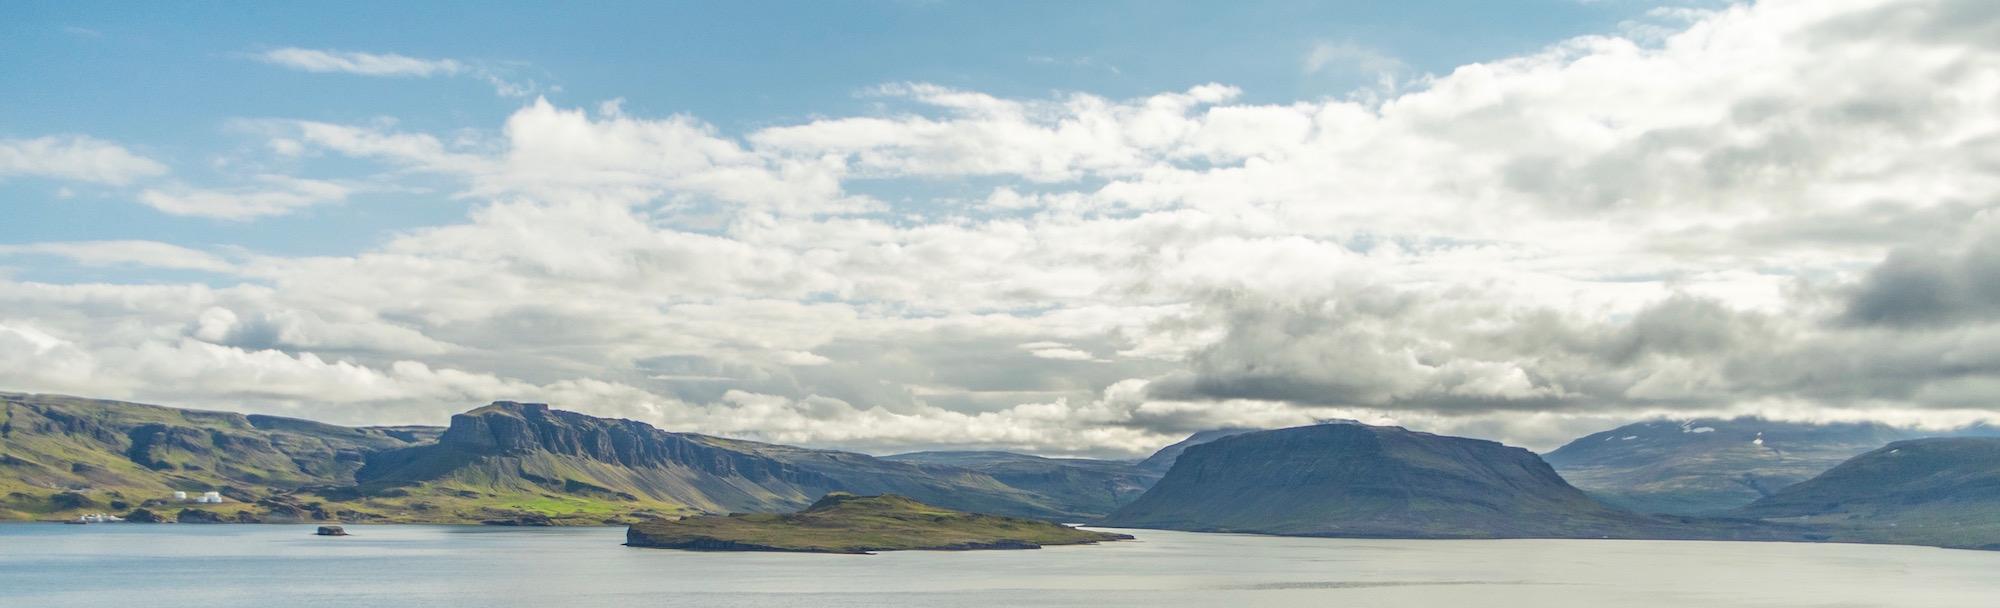 Hvalfjordur mountains